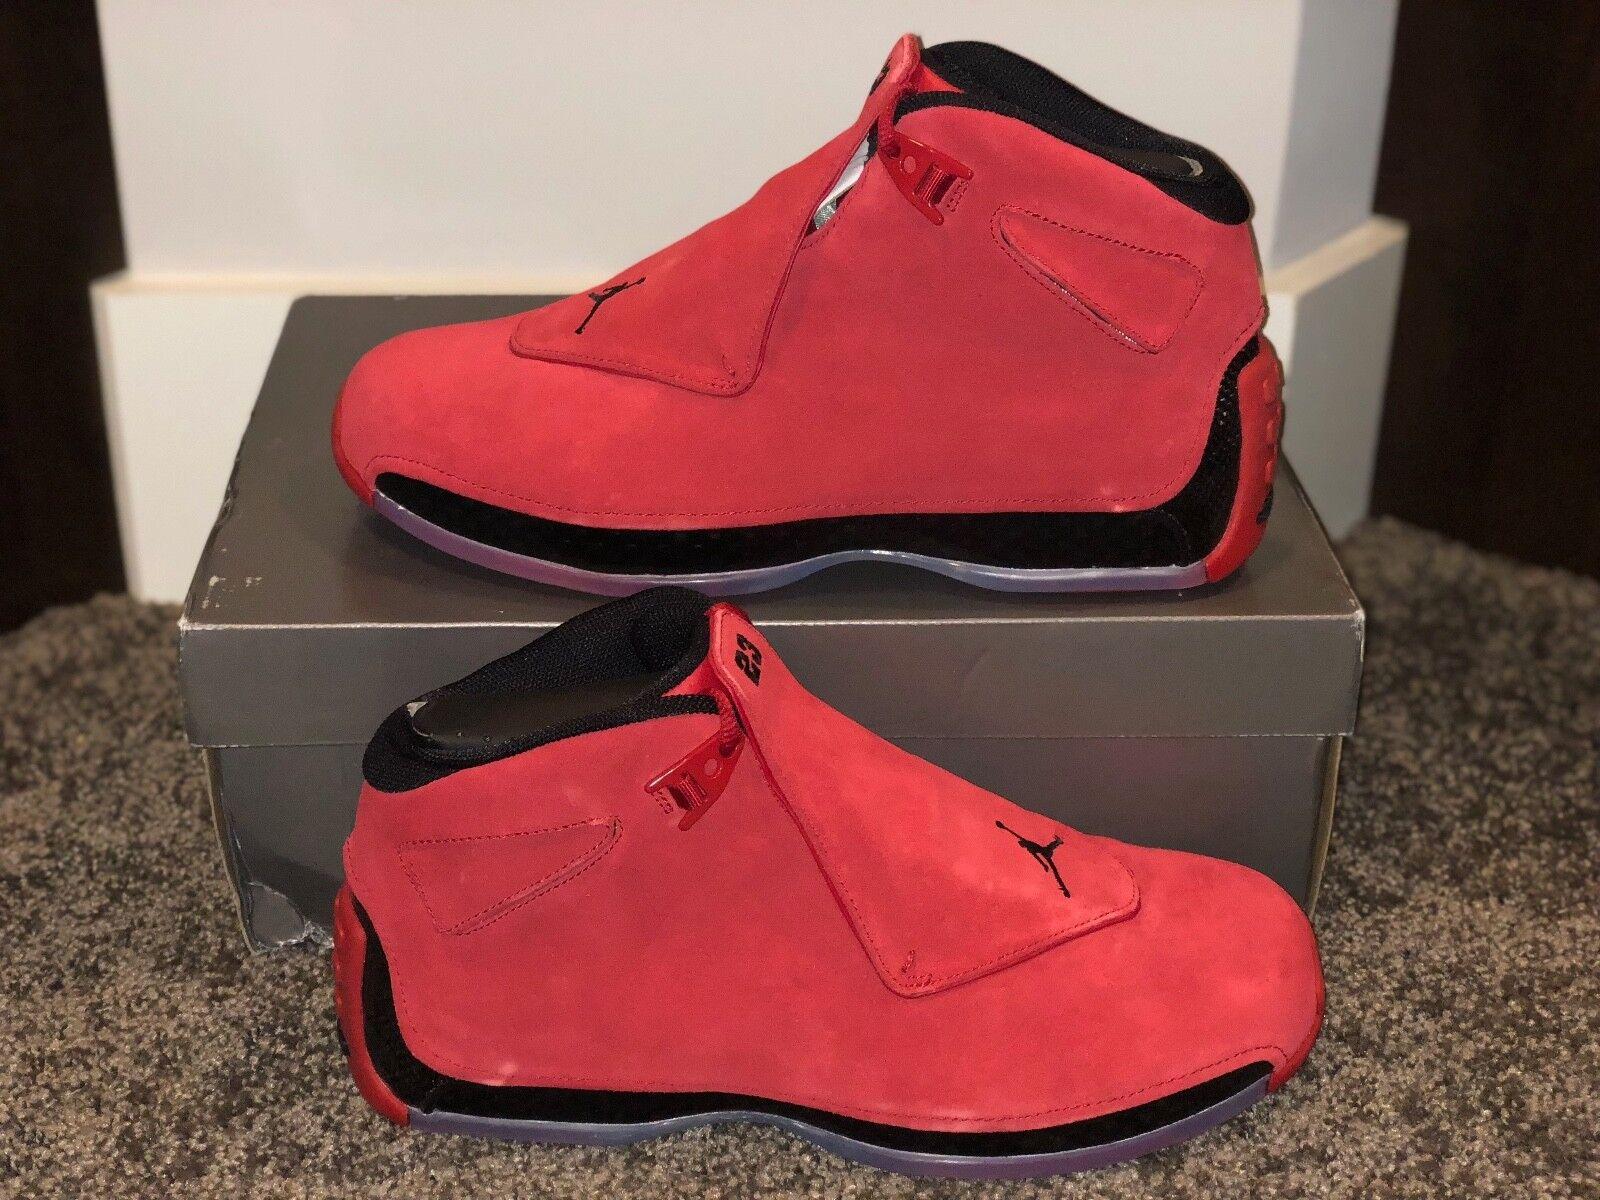 Nike air jordan xviii 18 toro retrò scamosciato x ds sz 11 x aa2494-601